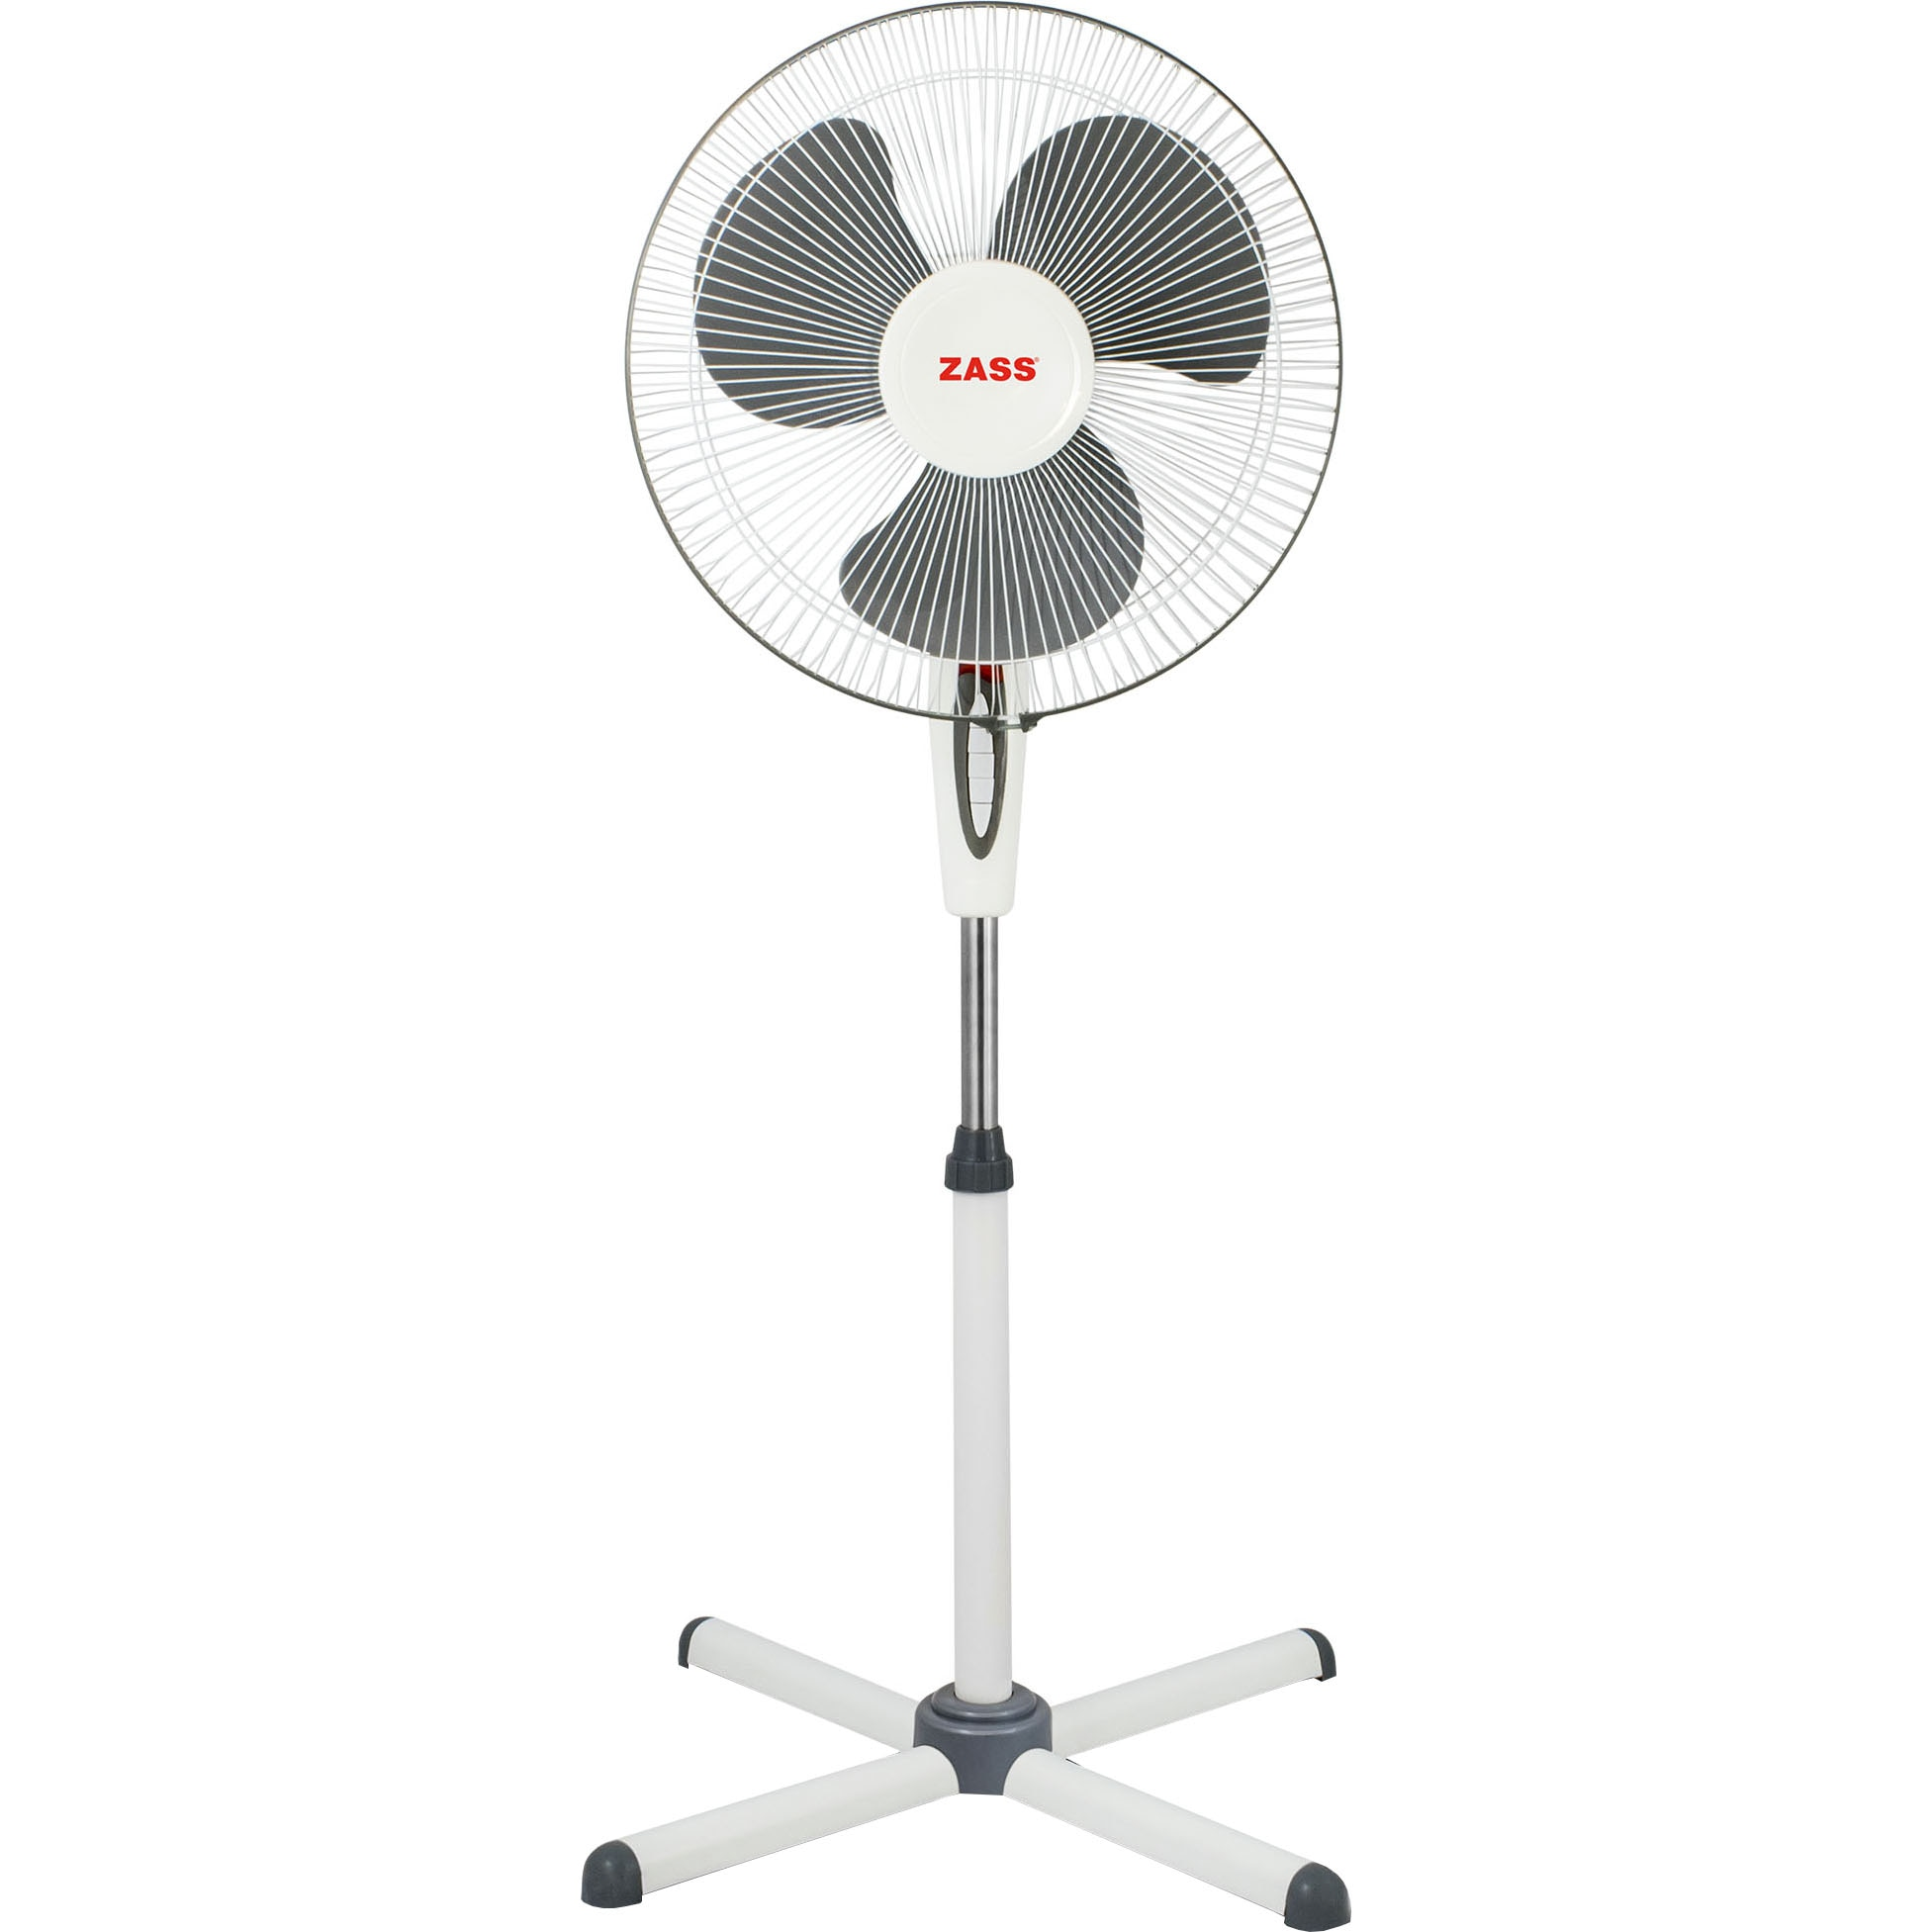 Fotografie Ventilator cu picior Zass ZF 1605, 45 W, 3 viteze, 41cm diametru, Alb